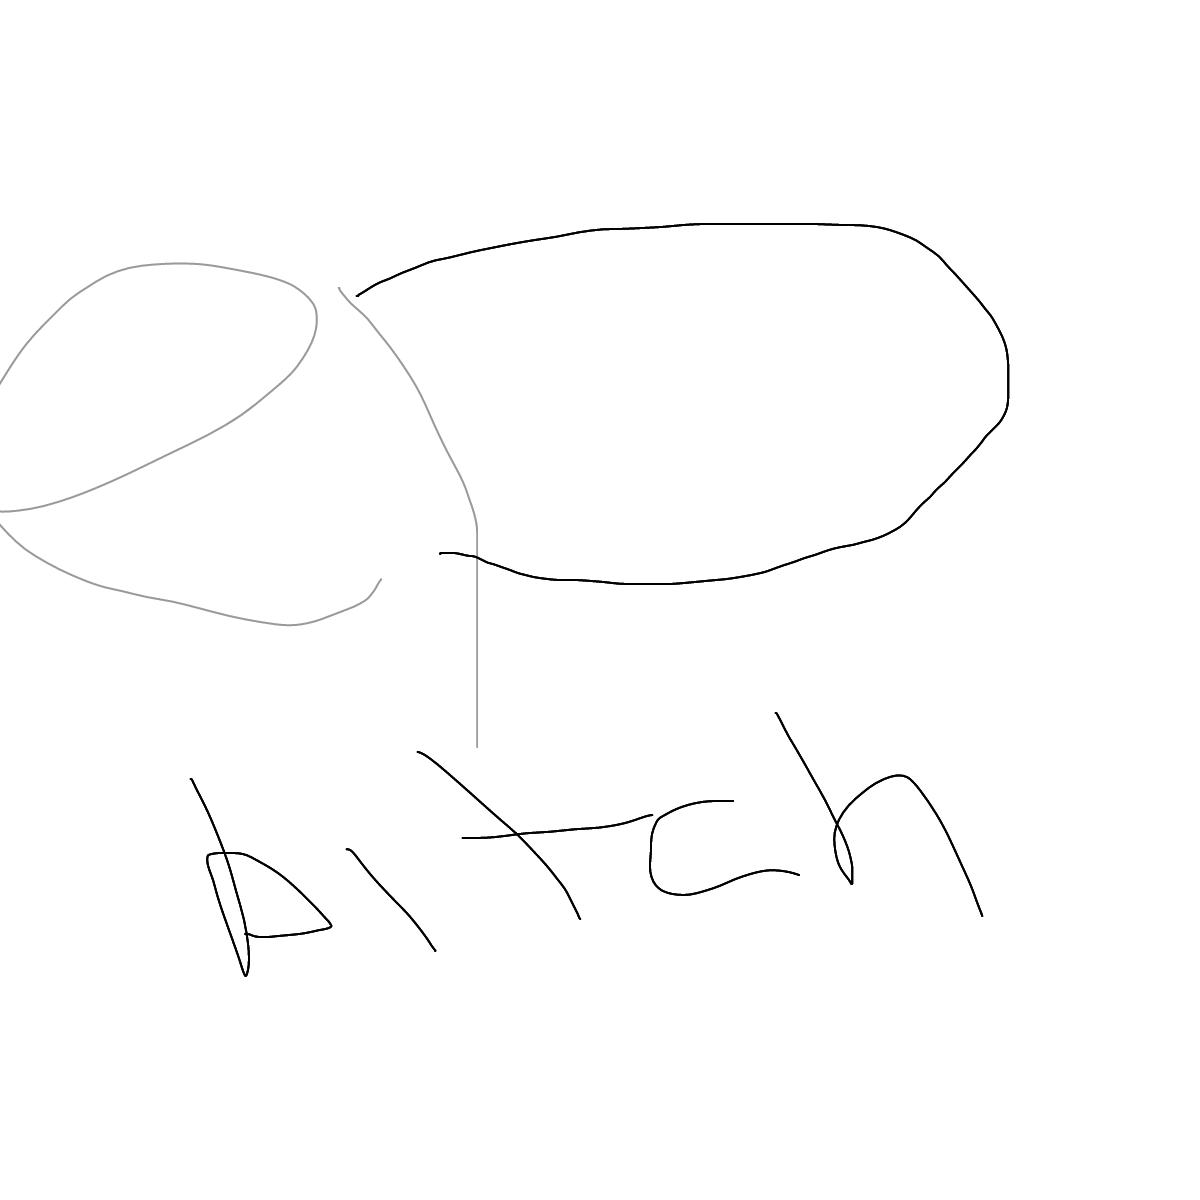 BAAAM drawing#225 lat:46.8541679382324200lng: -71.3329315185546900